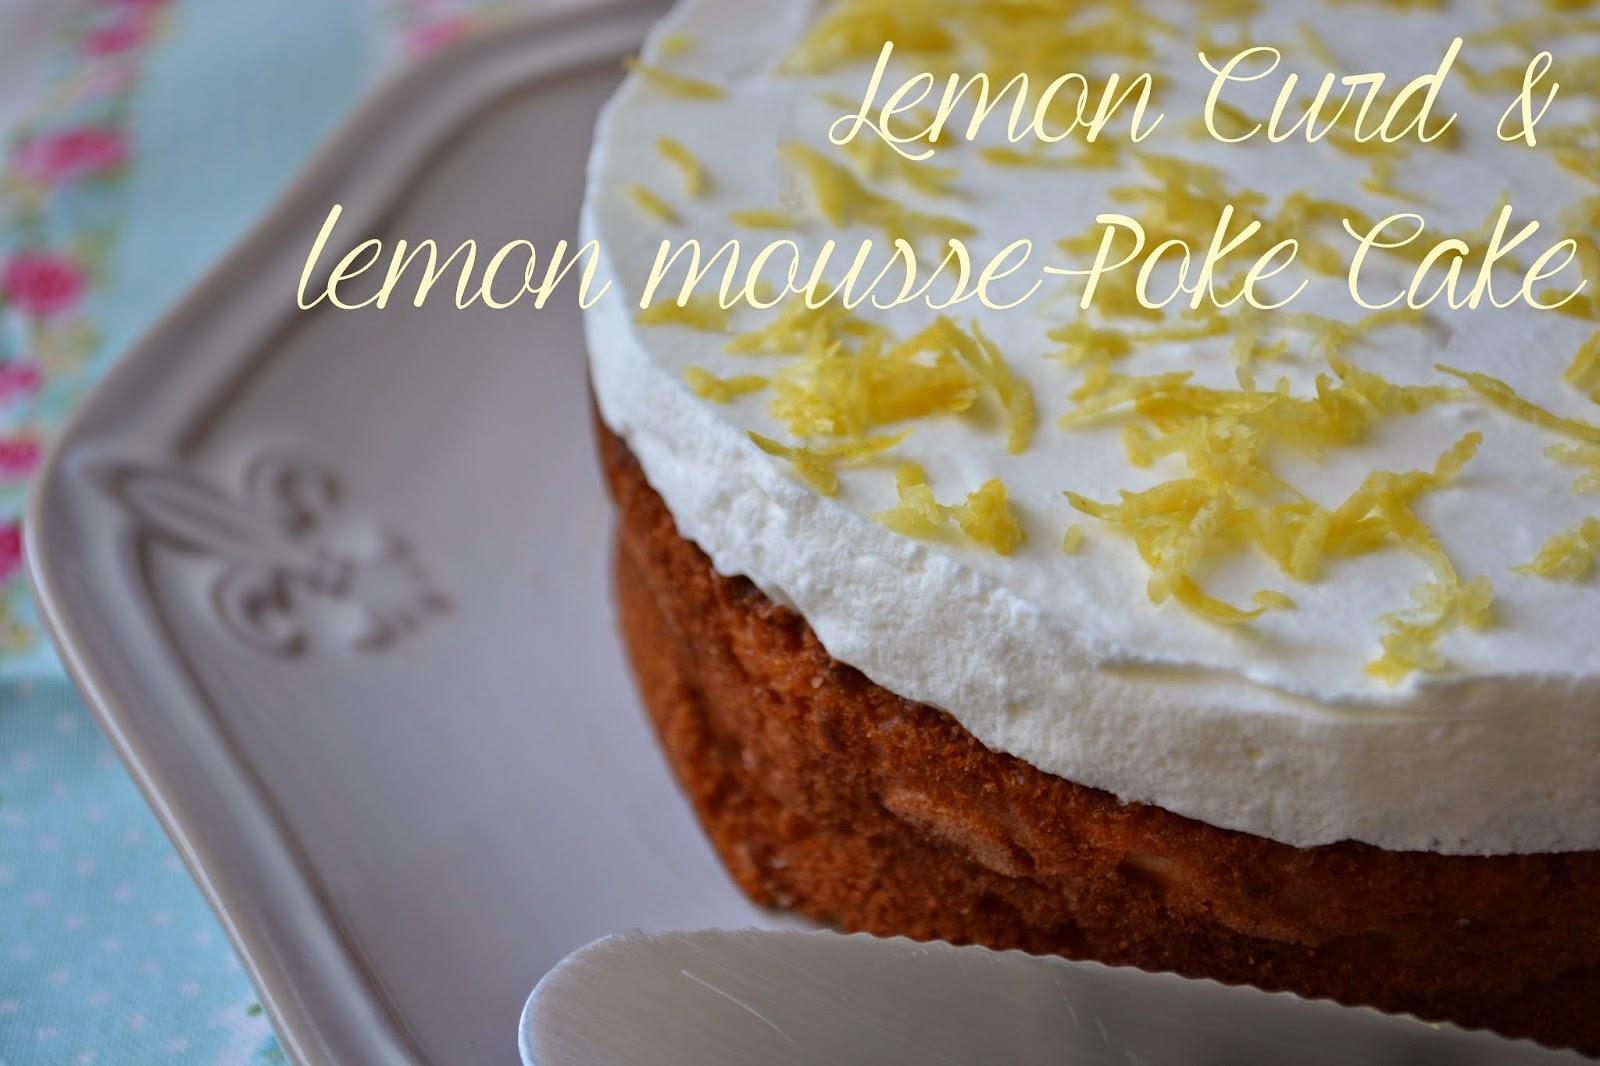 Lemon Curd & lemon mousse Poke Cake - Las cosas de mi cocina